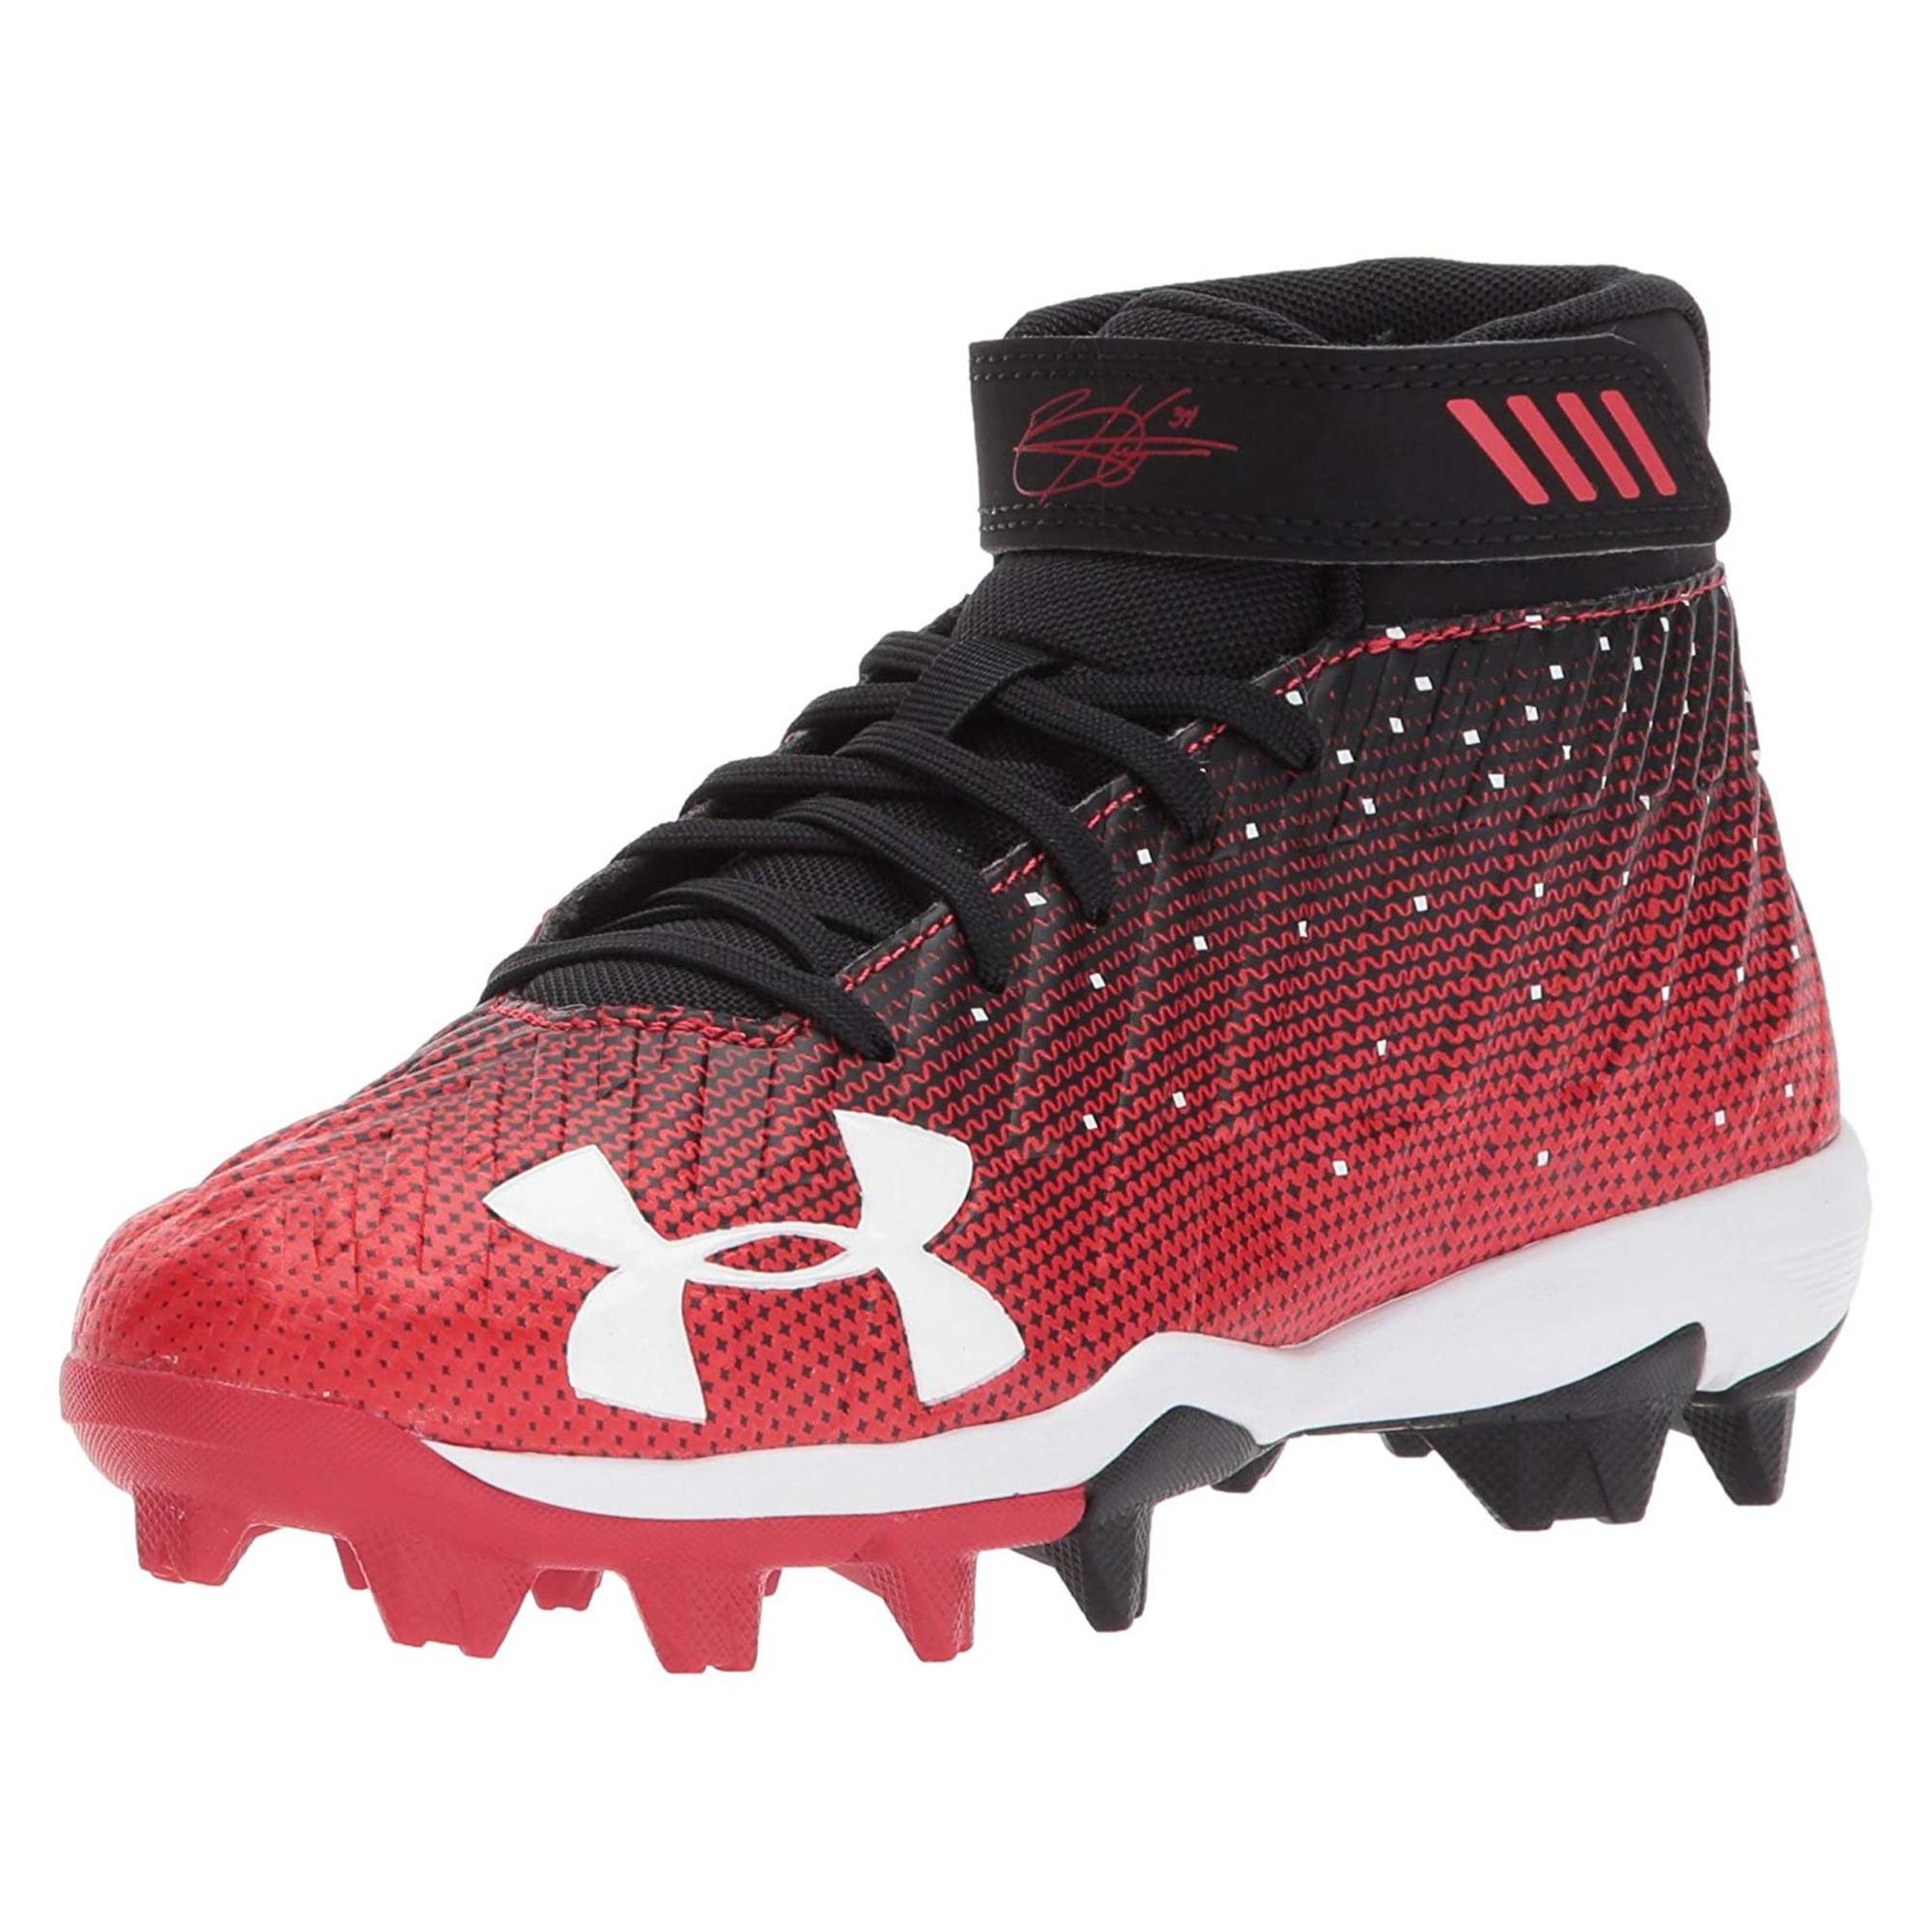 83c4771f0bc Under Armour Kids  Harper 2 RM Jr. Baseball Shoe